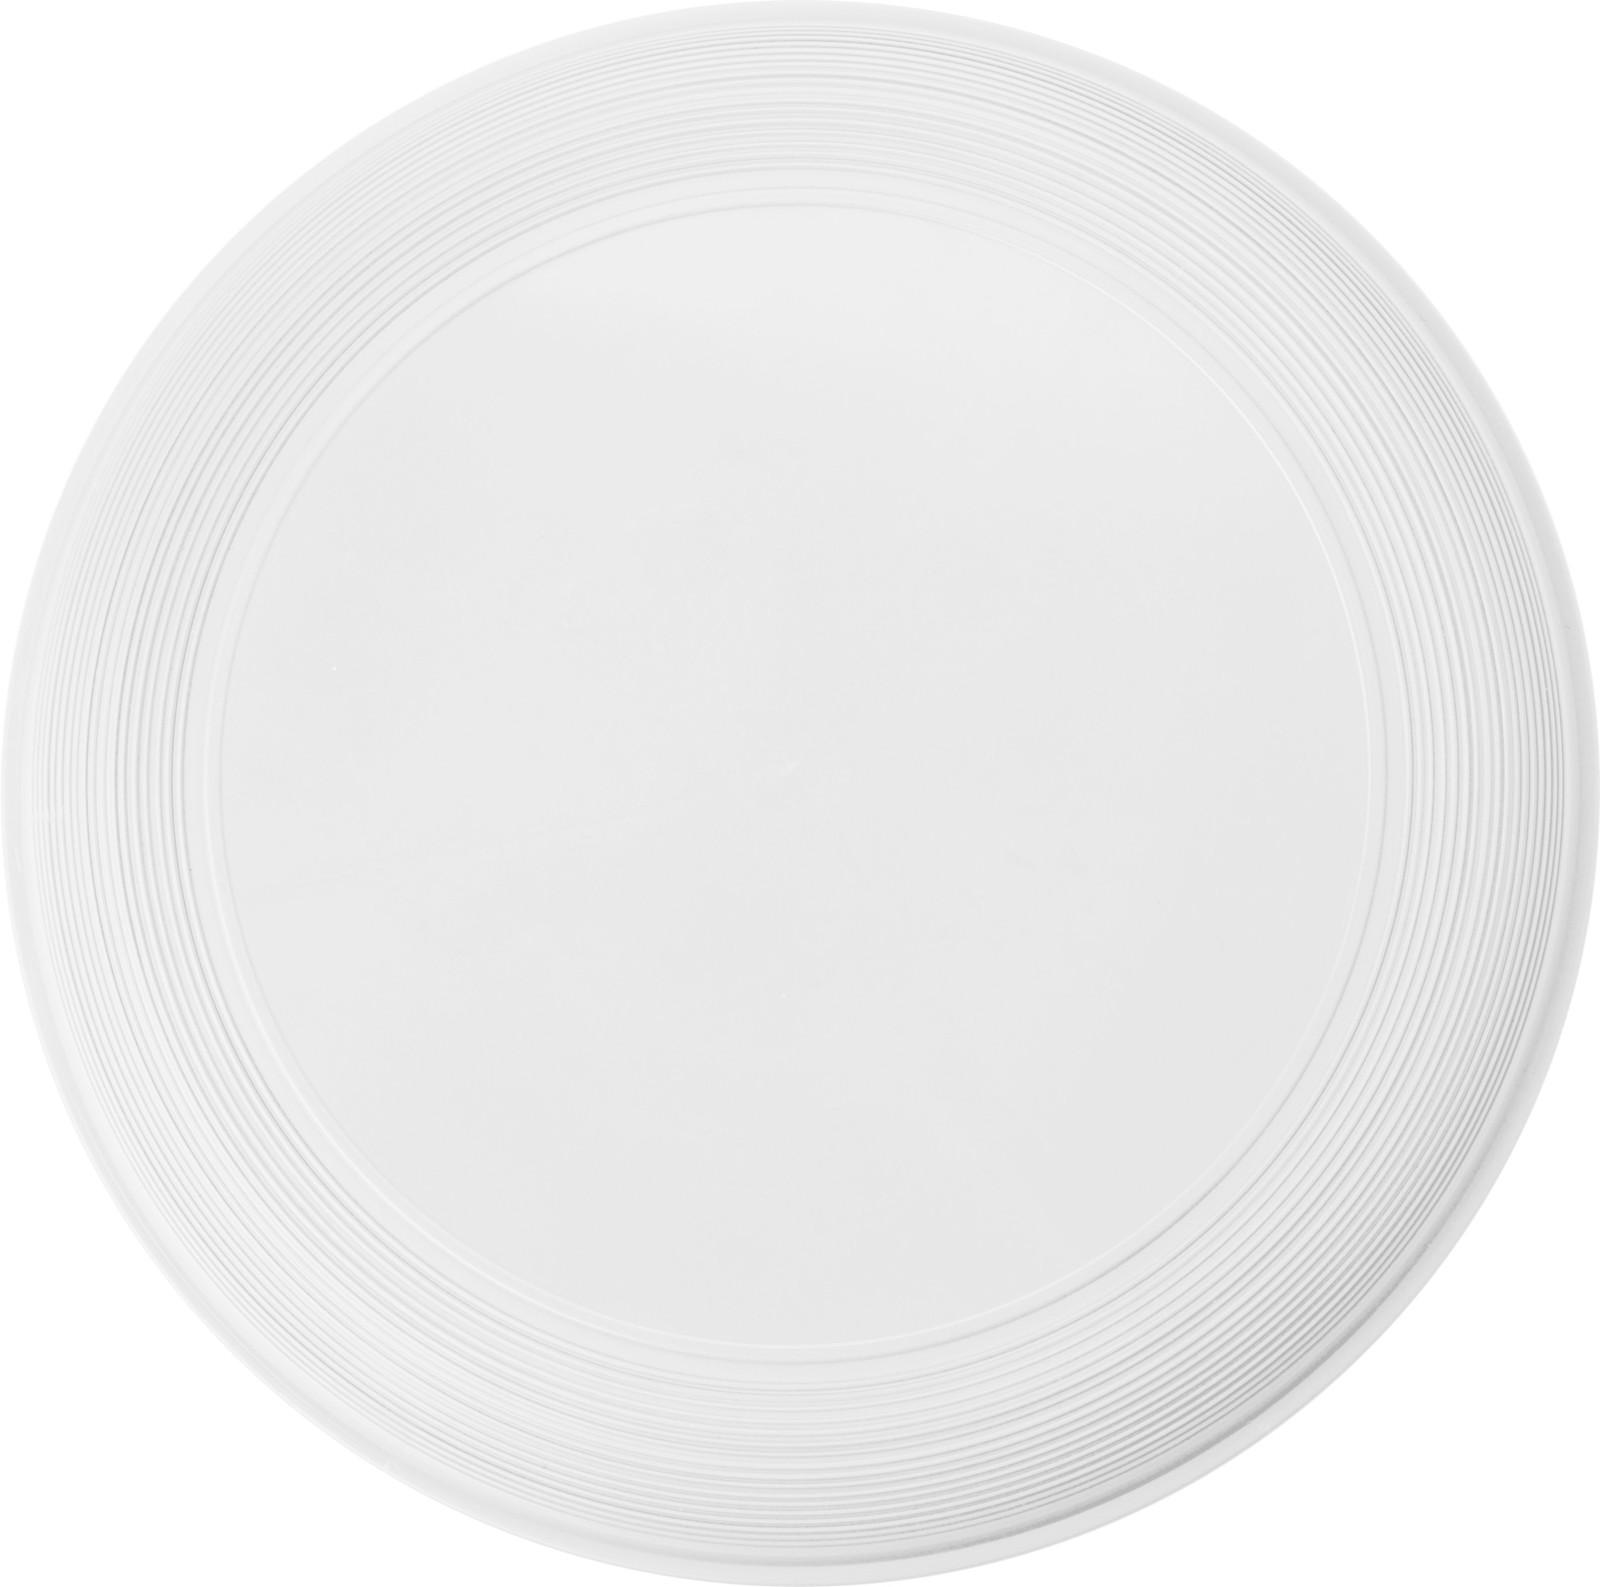 PP Frisbee - White